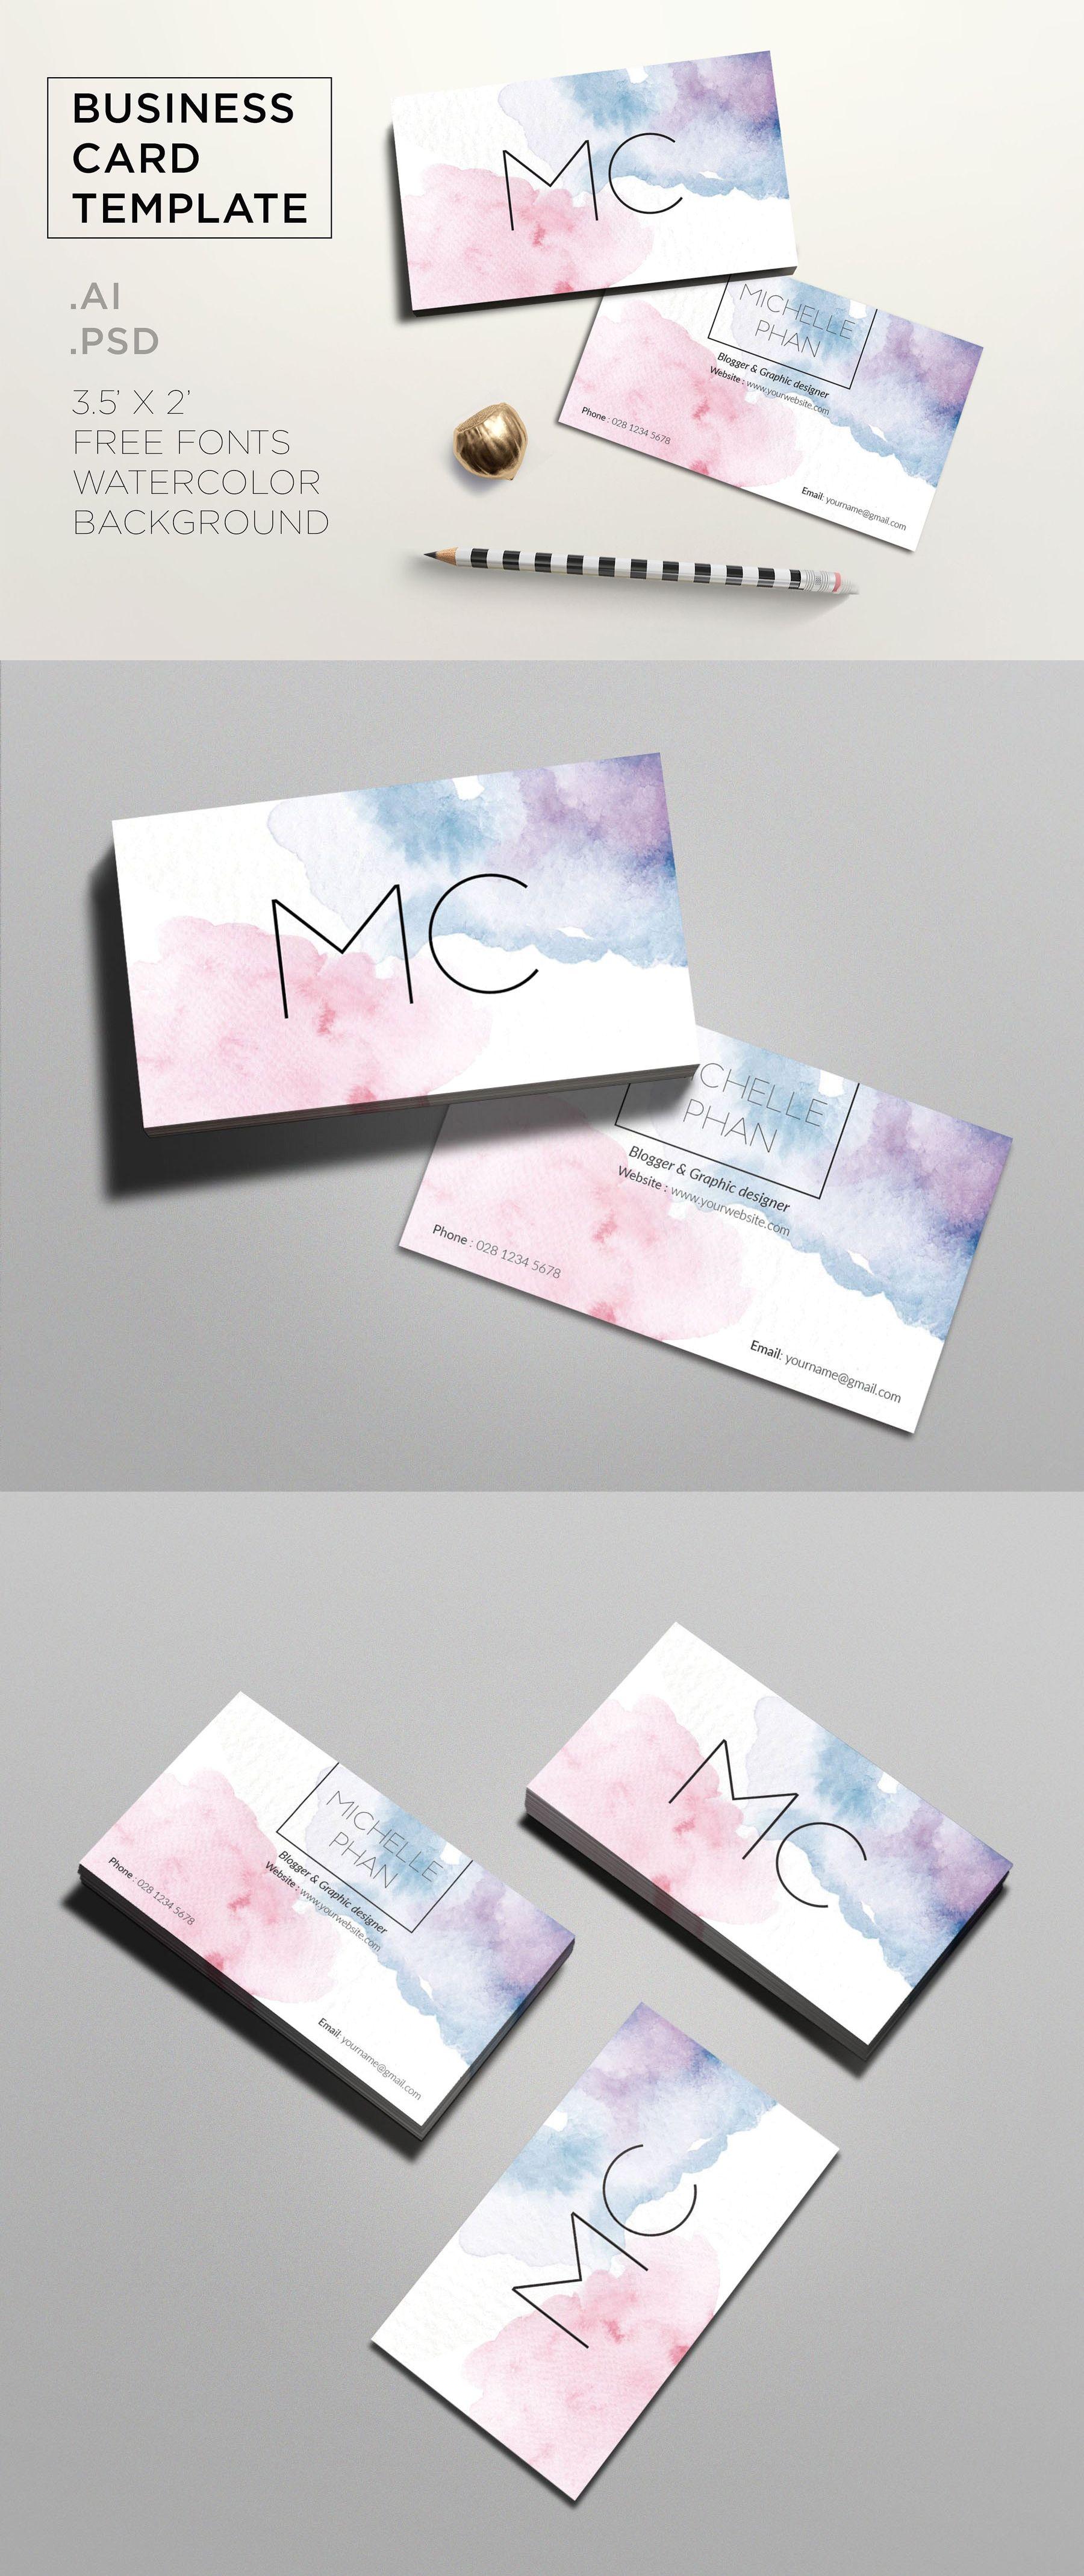 Creative watercolor business card watercolor business cards creative watercolor business card templates ai psd flashek Images